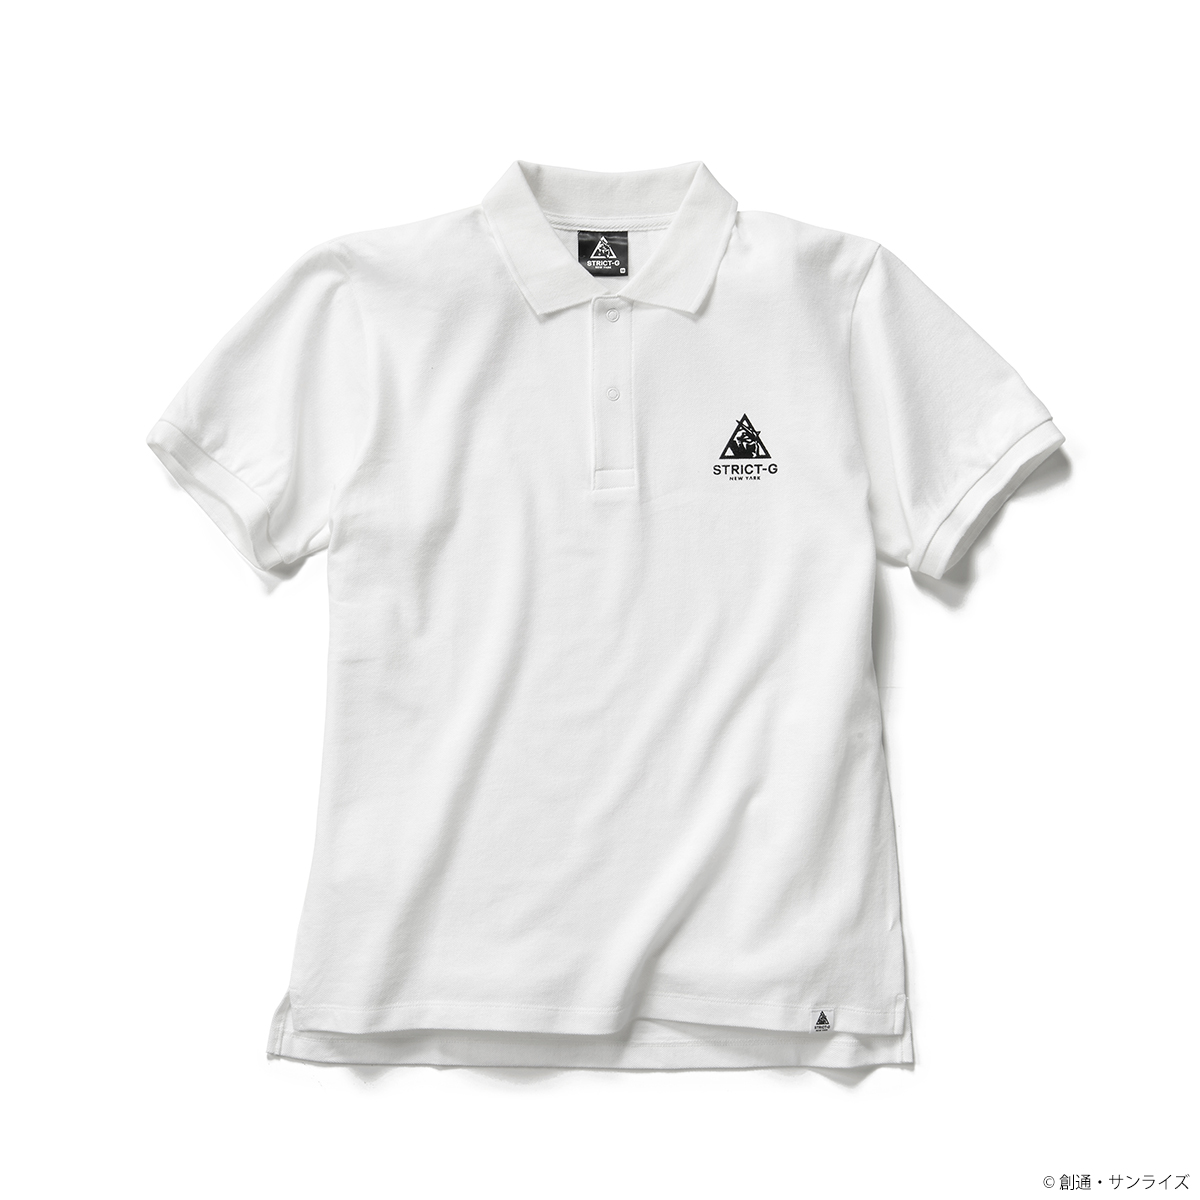 「STRICT-G NEW YARK」ポロシャツ NEW YARKロゴ柄